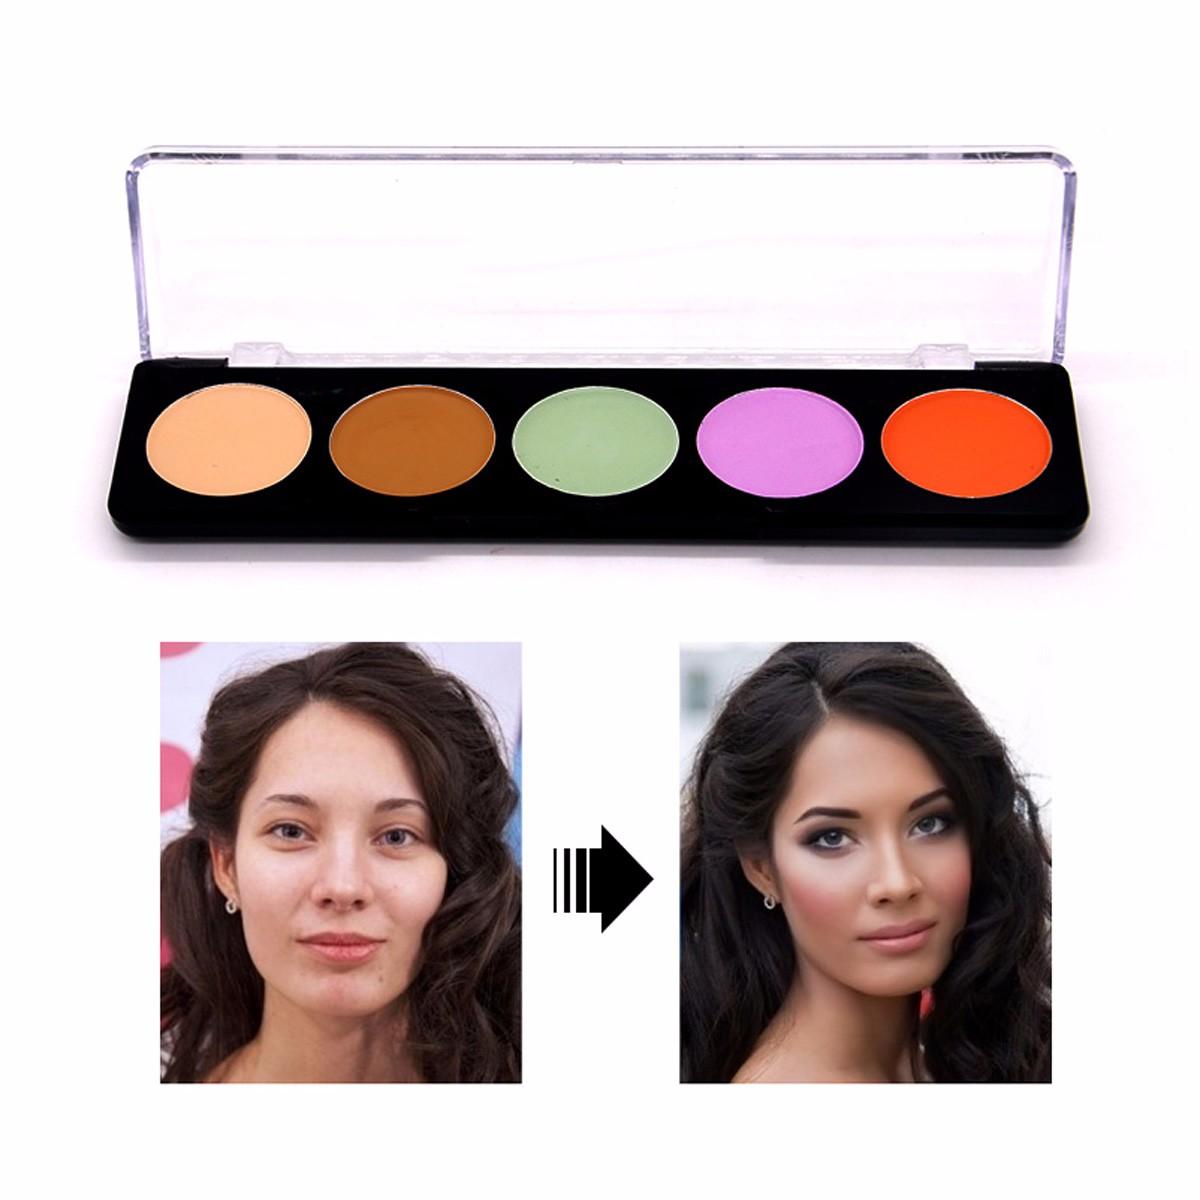 Miss Rose Concealer Face Makeup Natural Brighten Foundation Net Content 6g